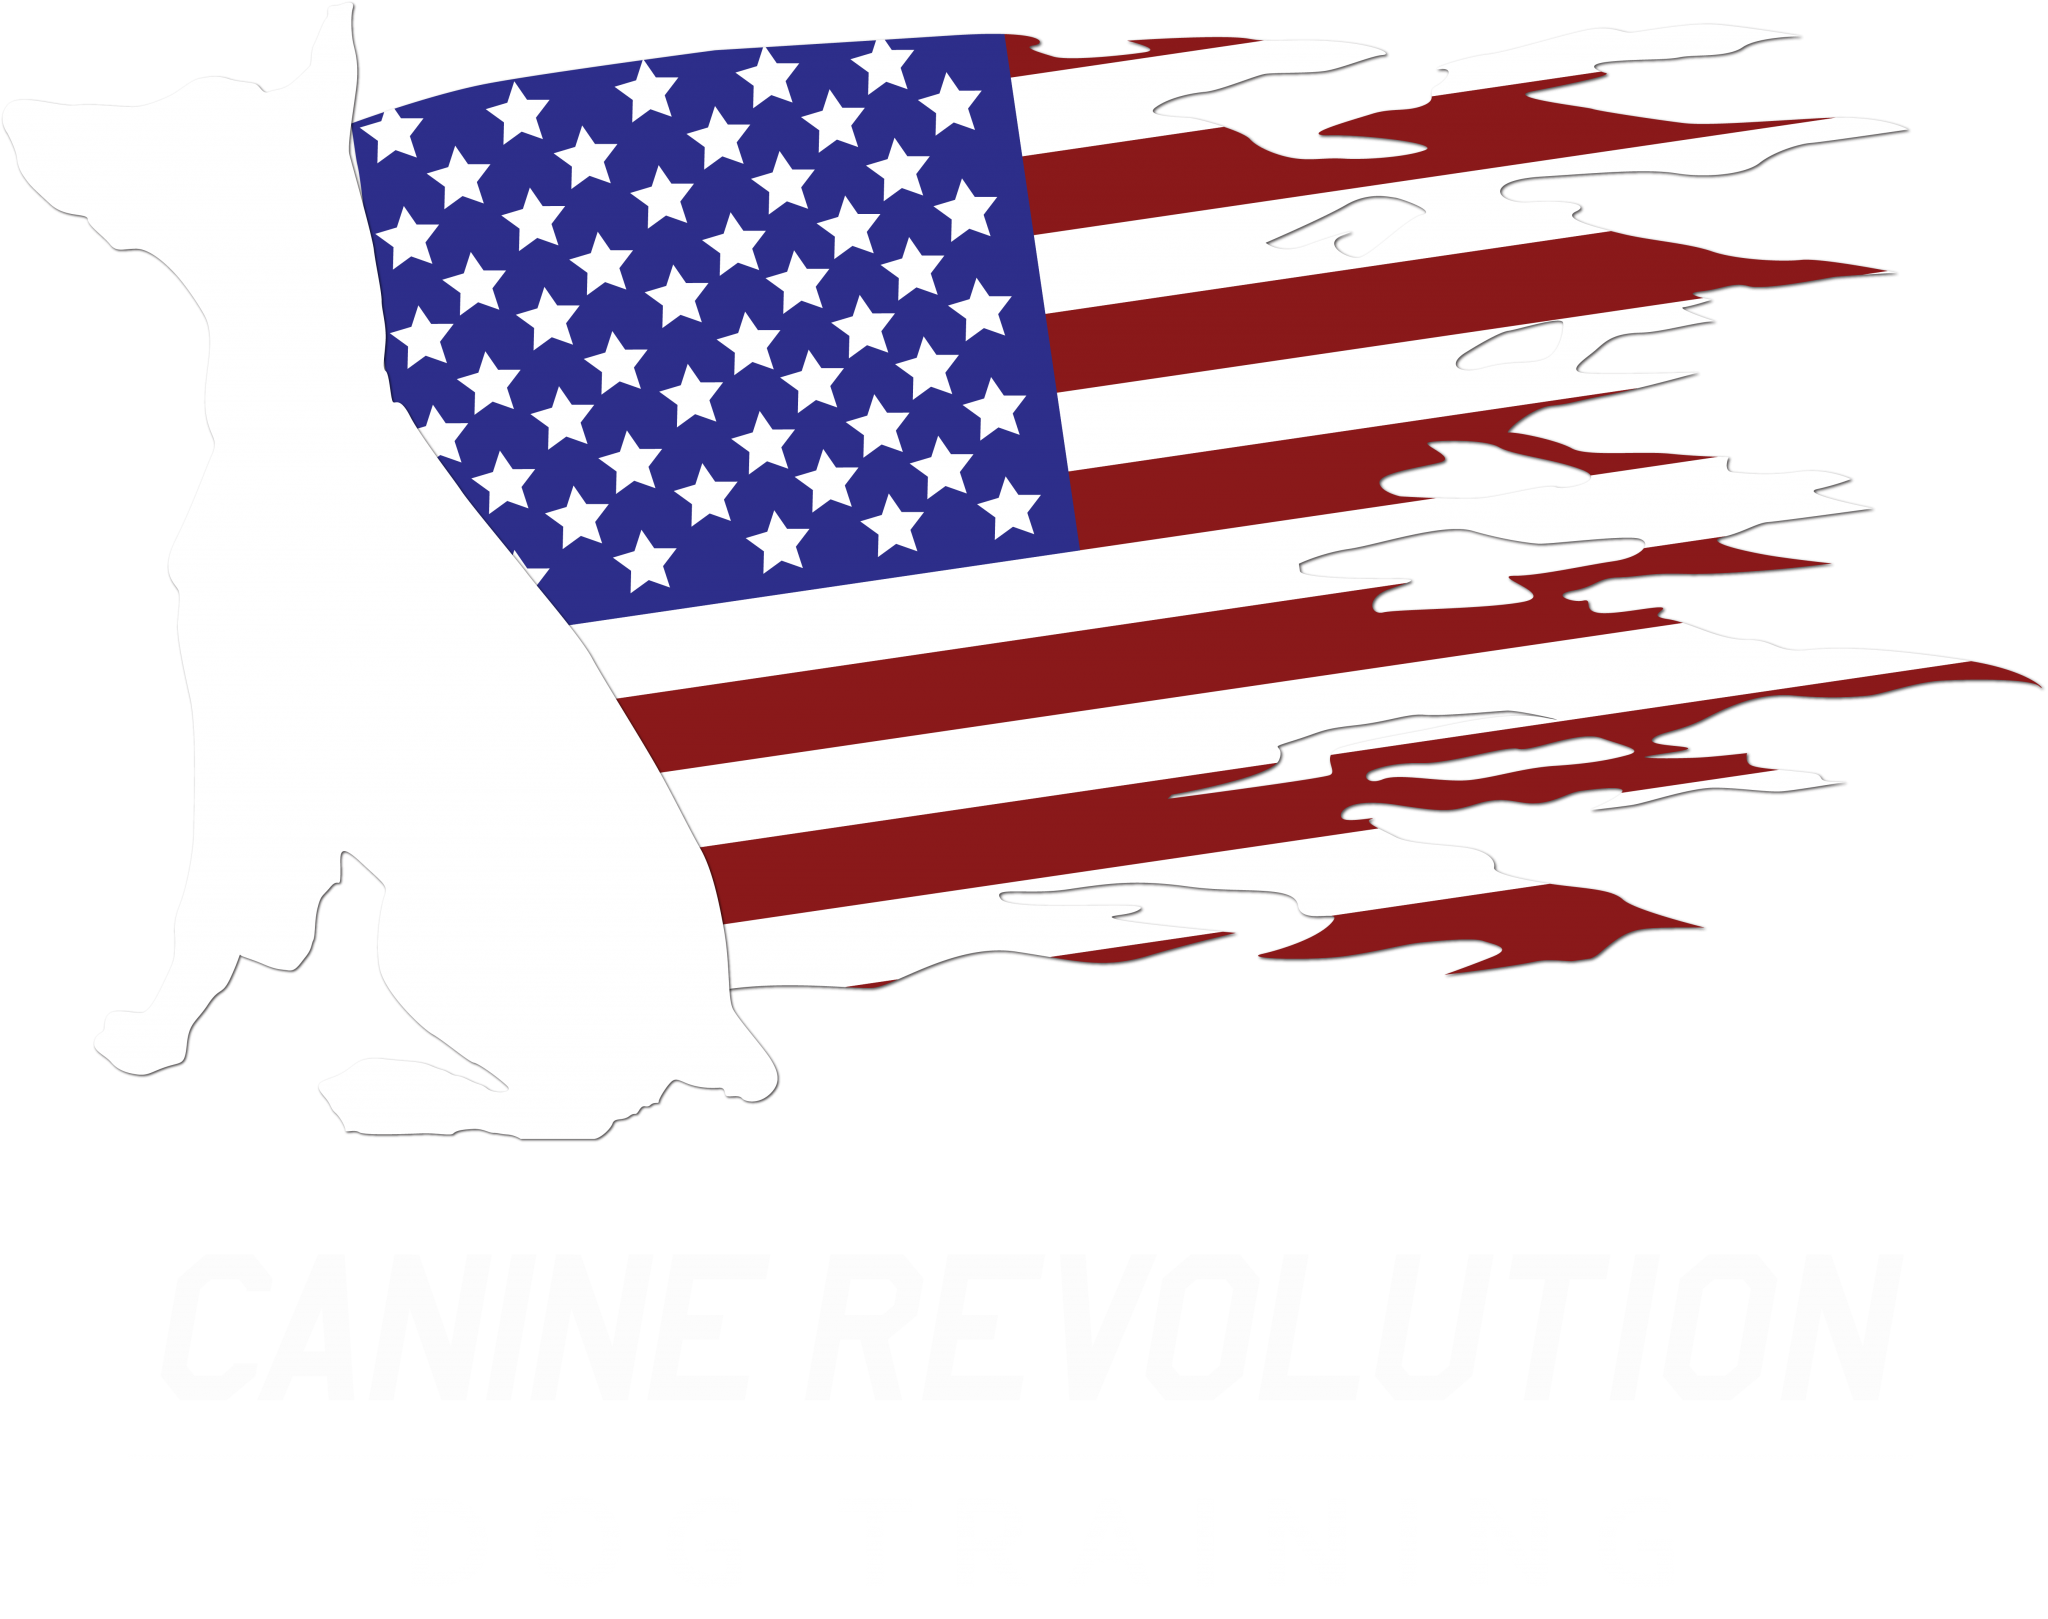 Canine Revolution Dog Training